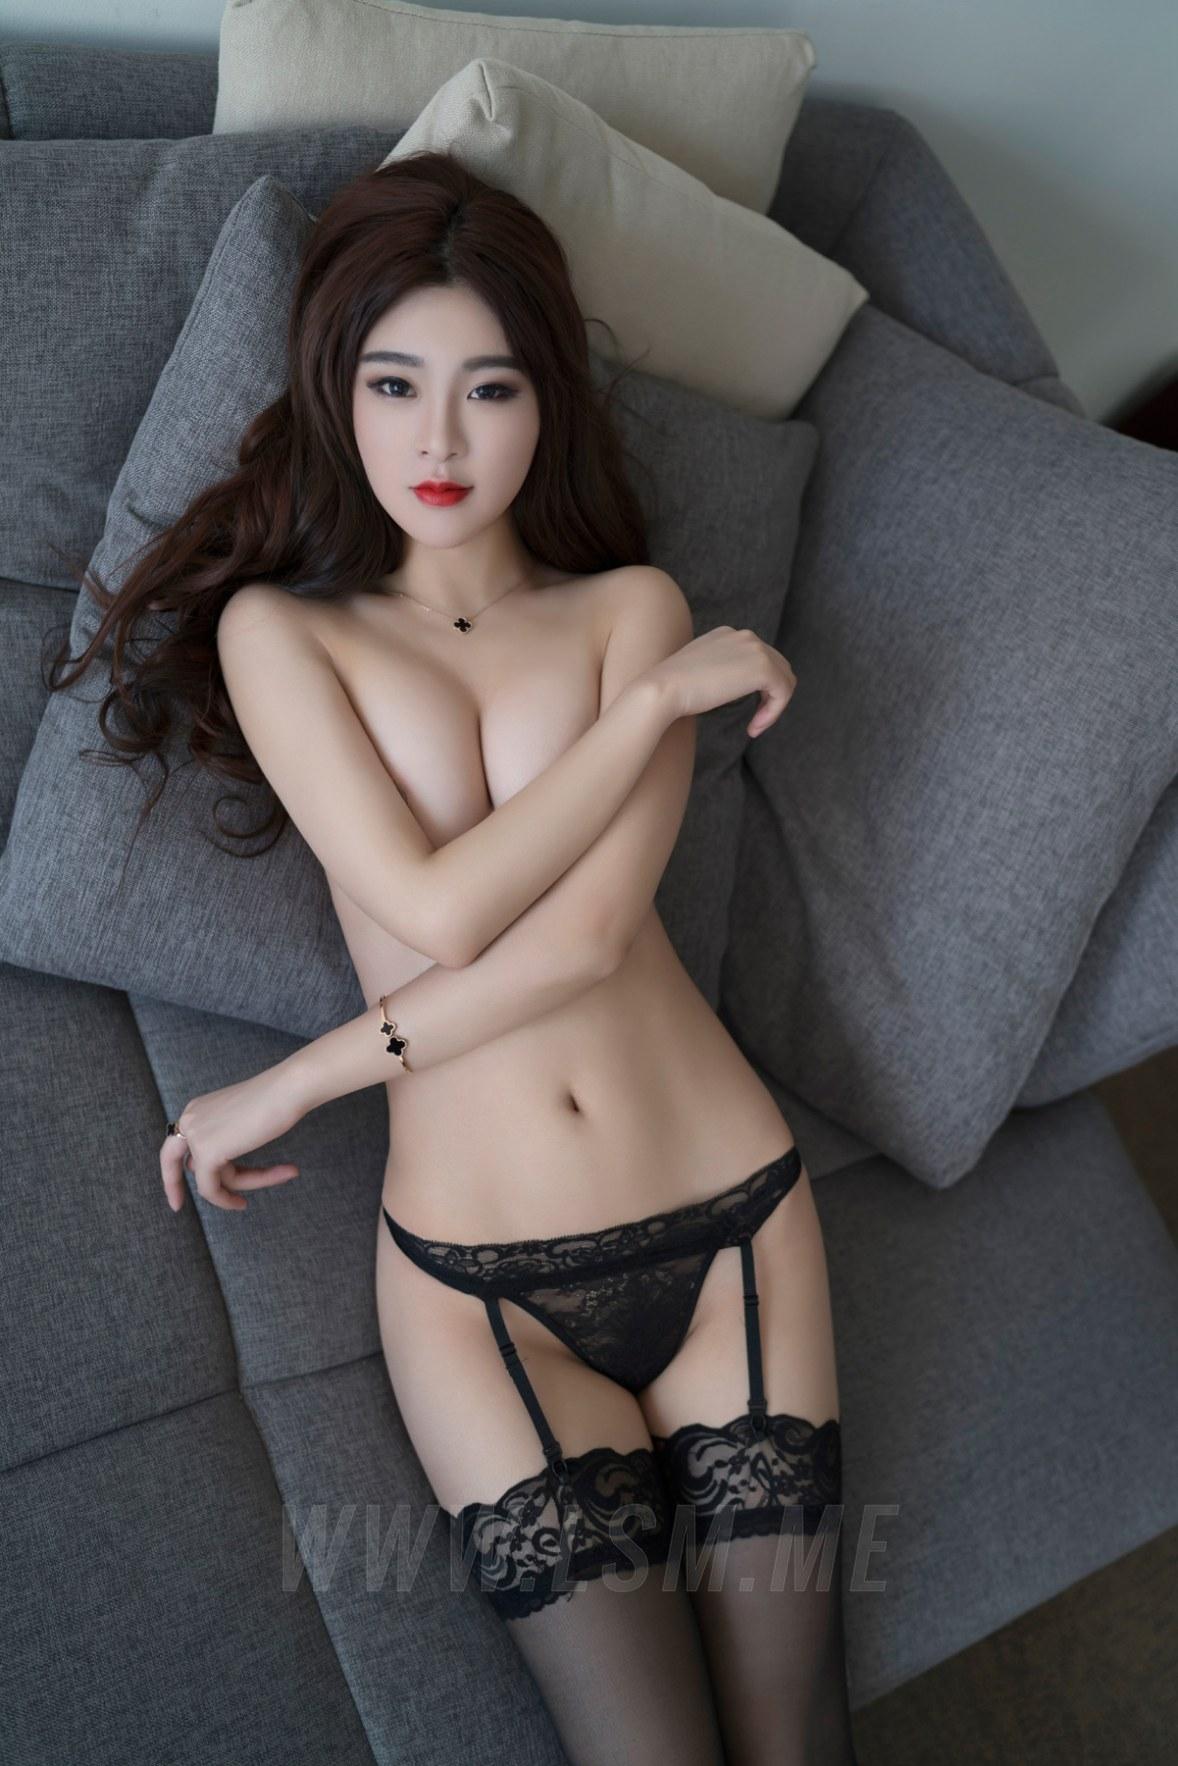 TuiGirl 推女郎 No.071 小九九【包内完整】 - 4